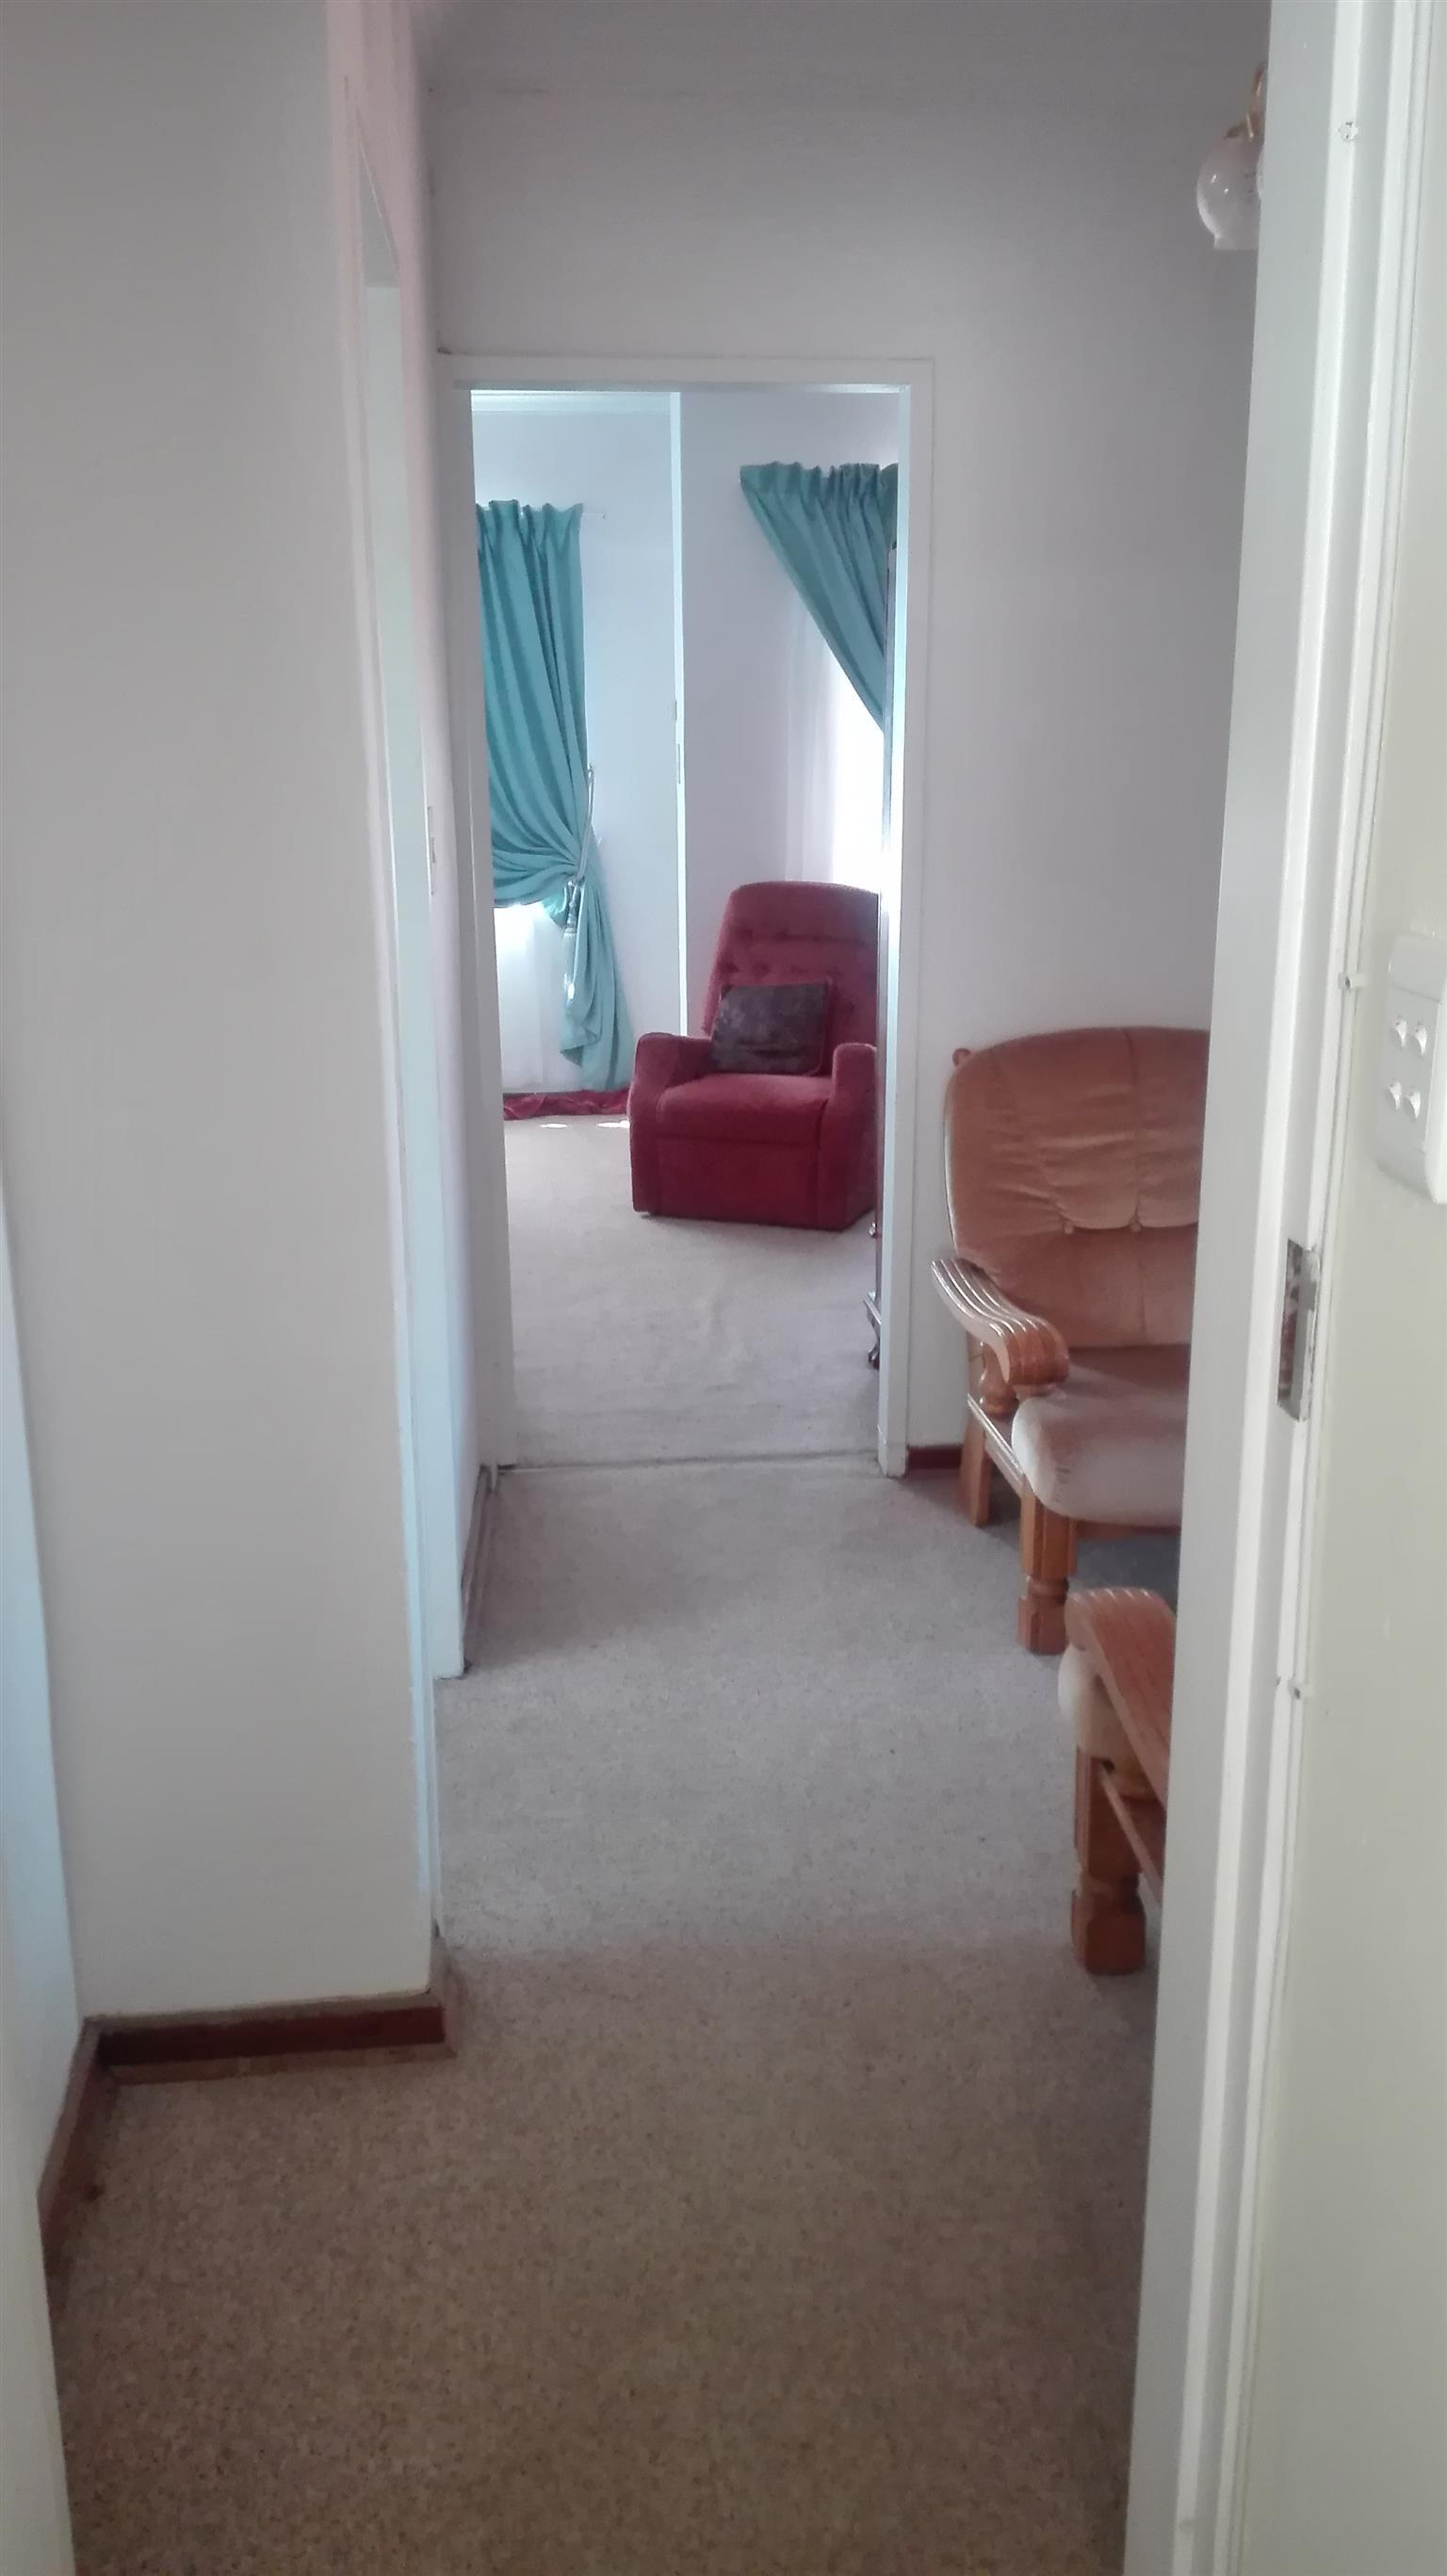 Waterkloof Glen R6850 1br  furnished